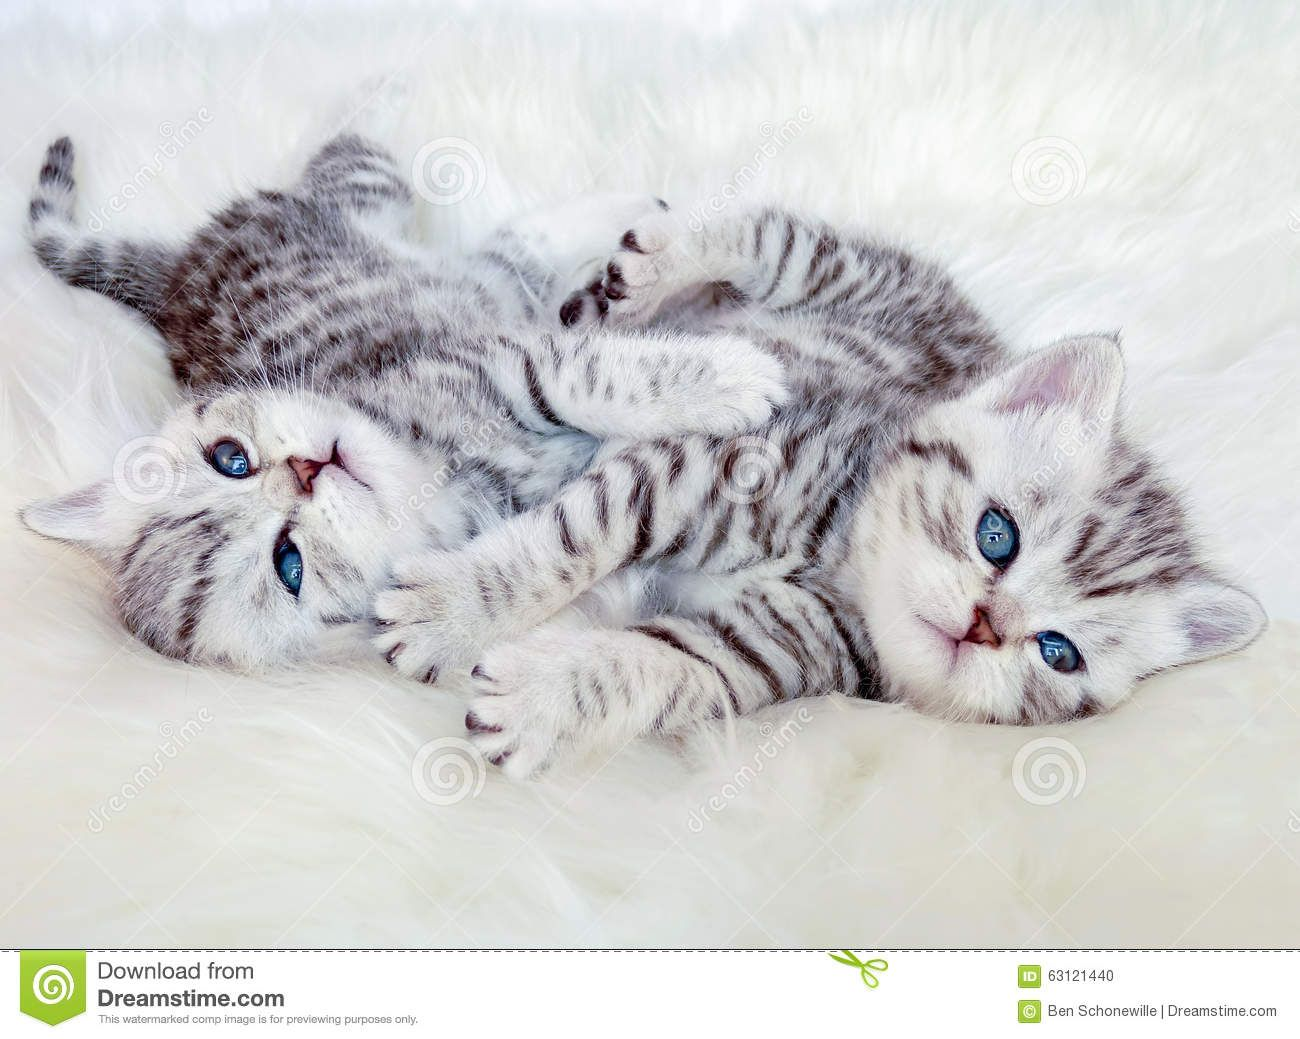 Pin Von Mac Cain Auf Bilder Baby Katzen Katzen Getigerte Katze